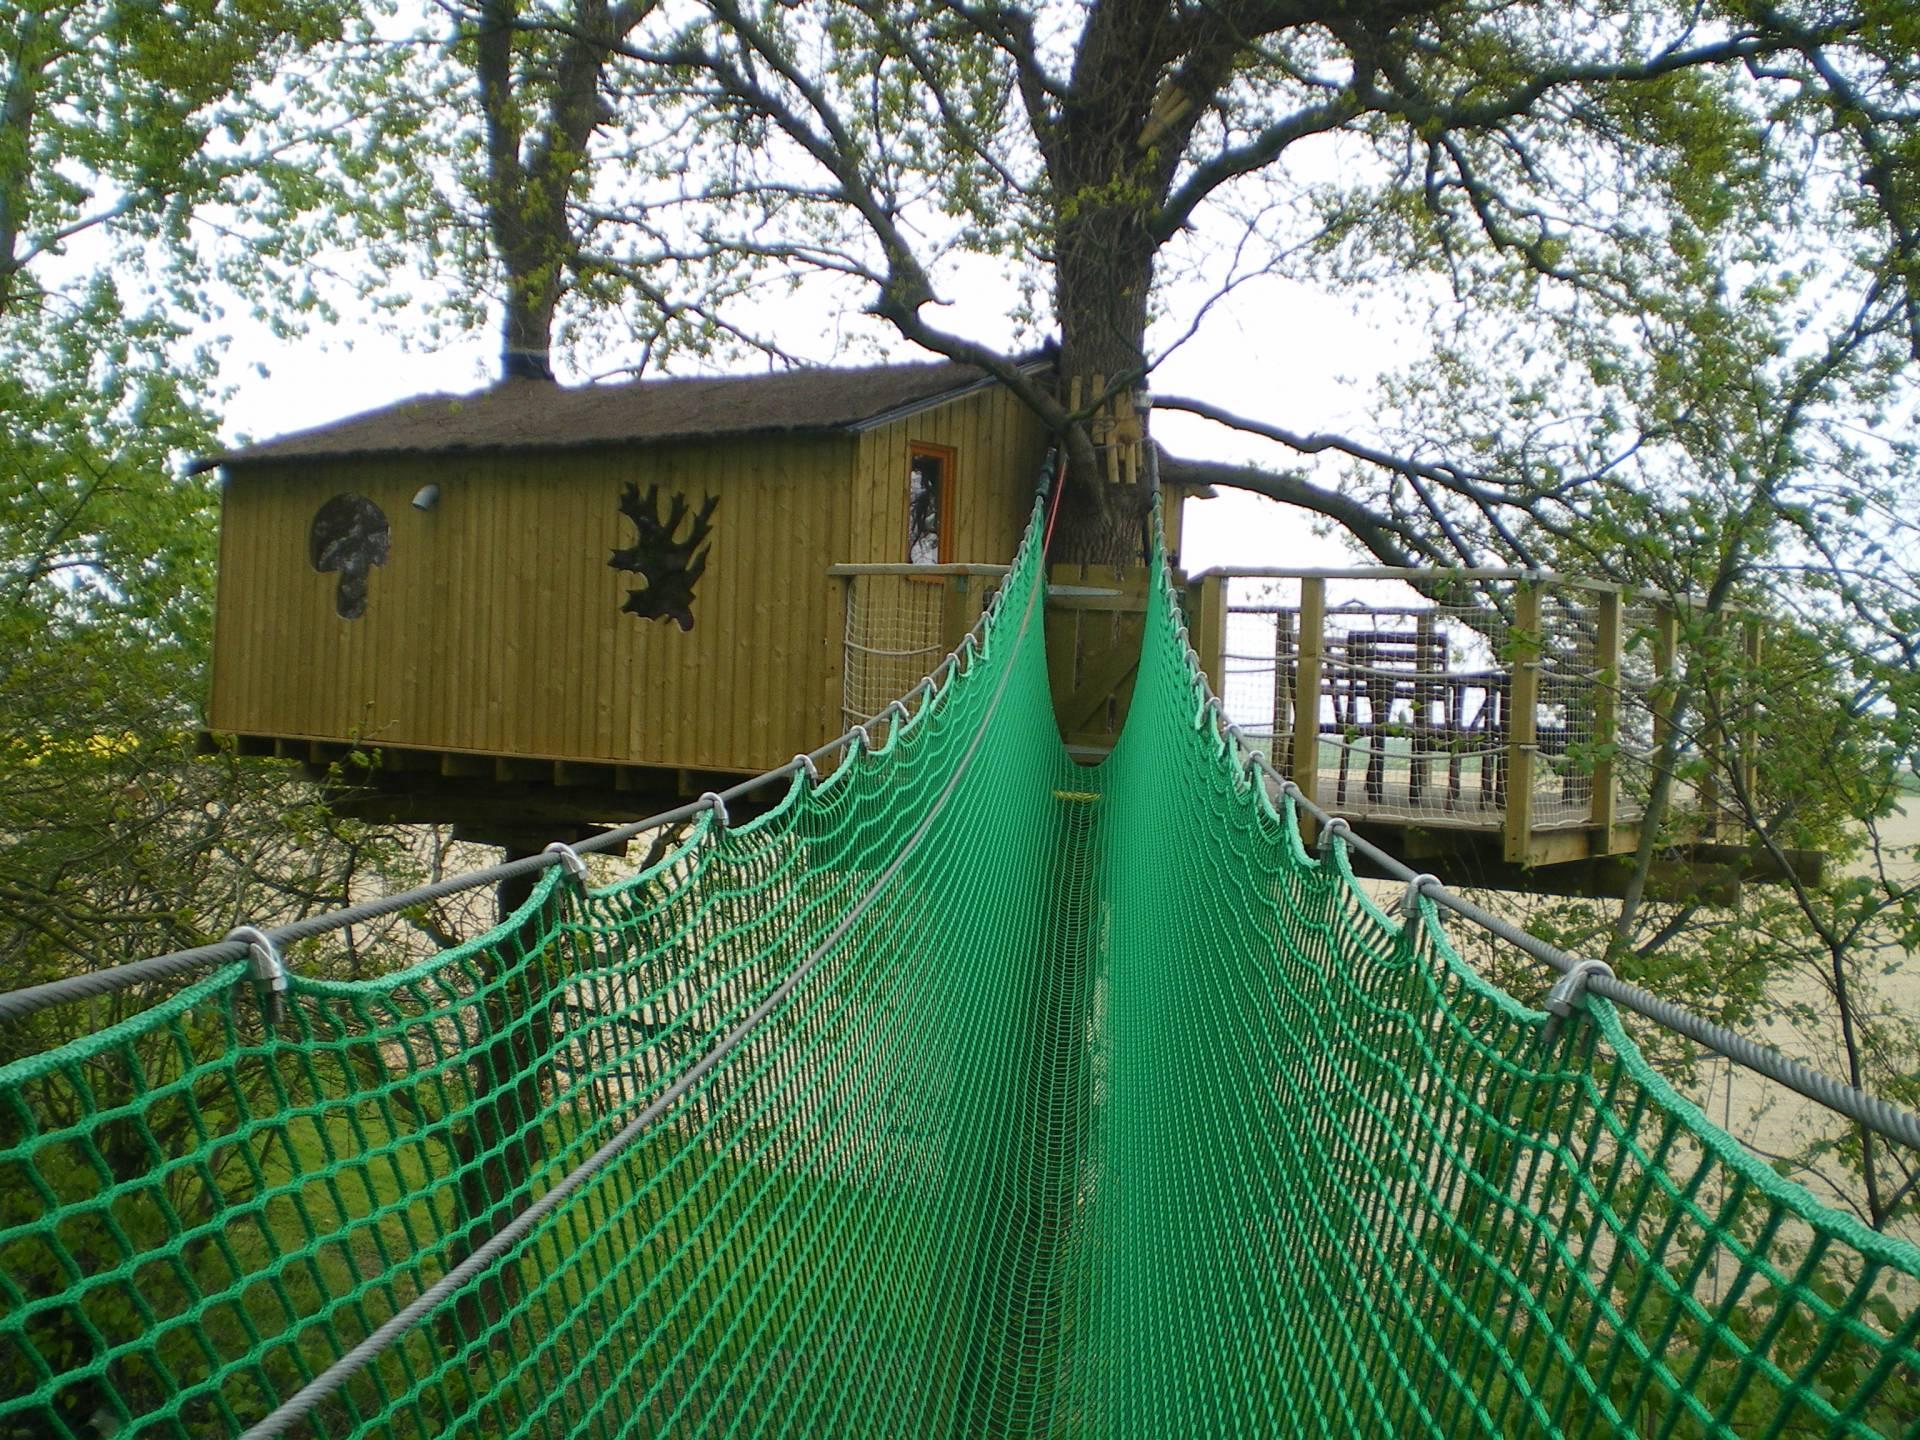 reposoir cabane dans les arbres bretagne hebergement insolite dormir bulle. Black Bedroom Furniture Sets. Home Design Ideas